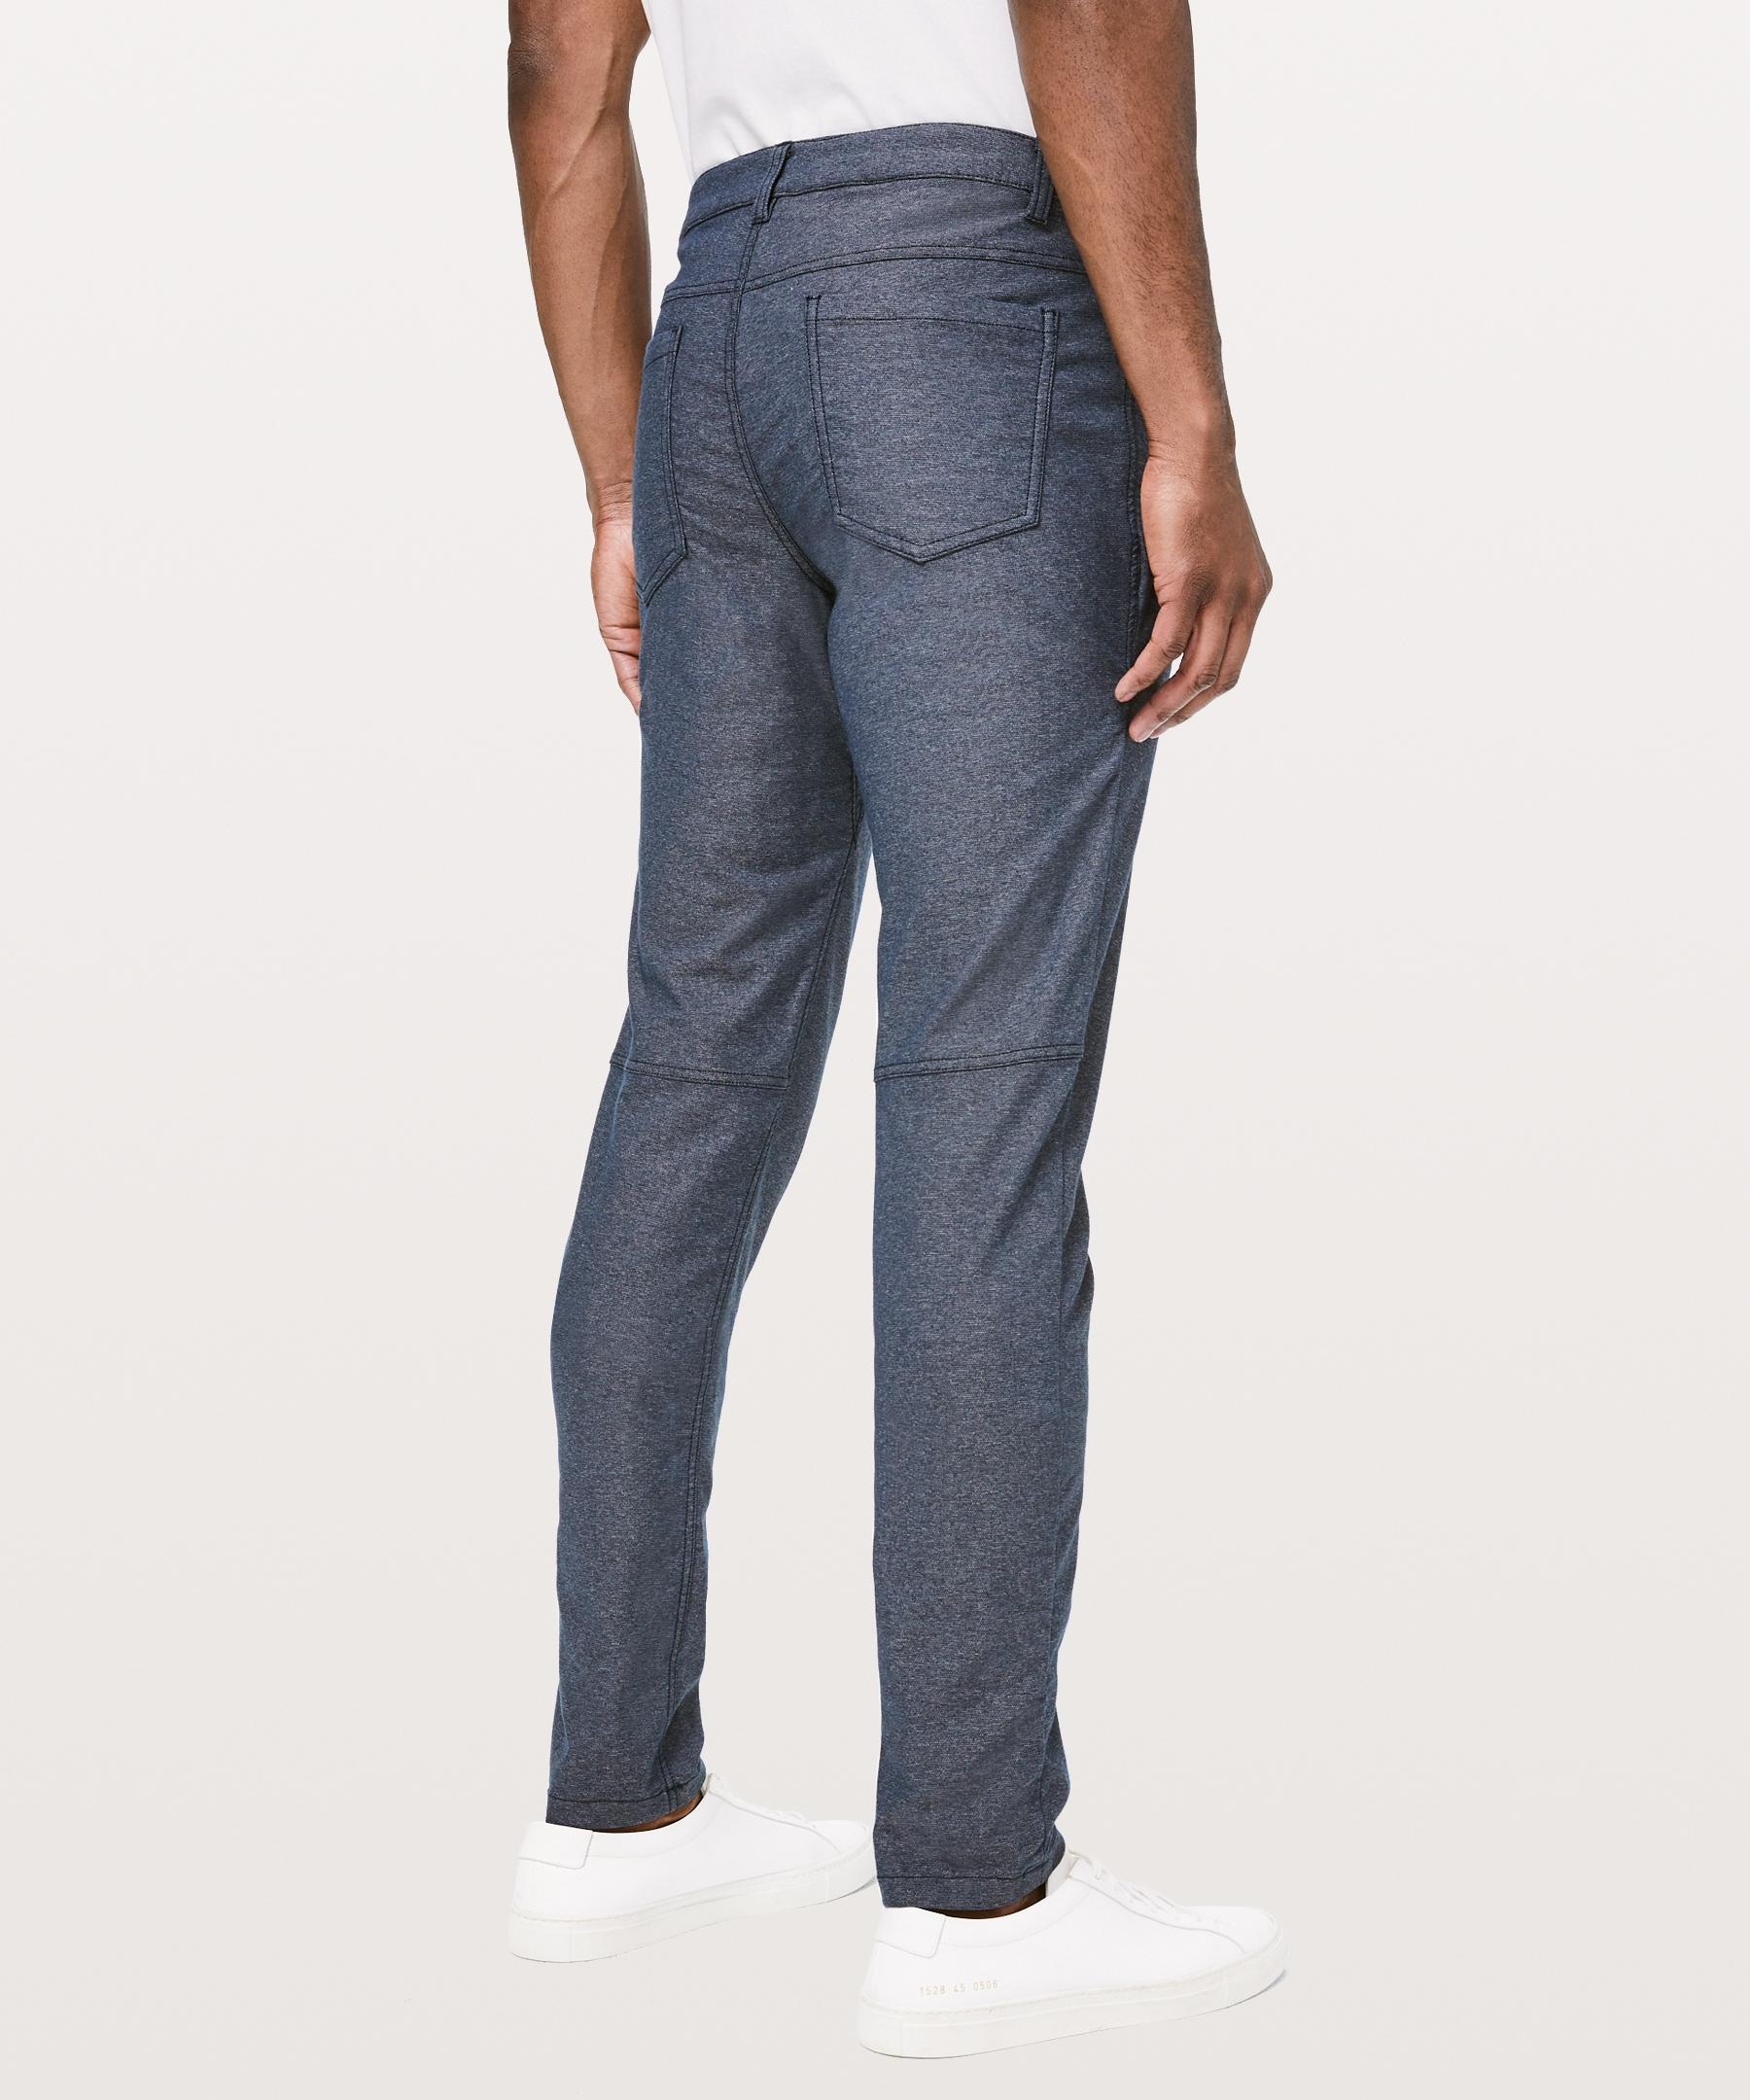 Mens Korean Style Cotton Stretch Long Slim Feet d4 Trousers Fashion Pants NEW